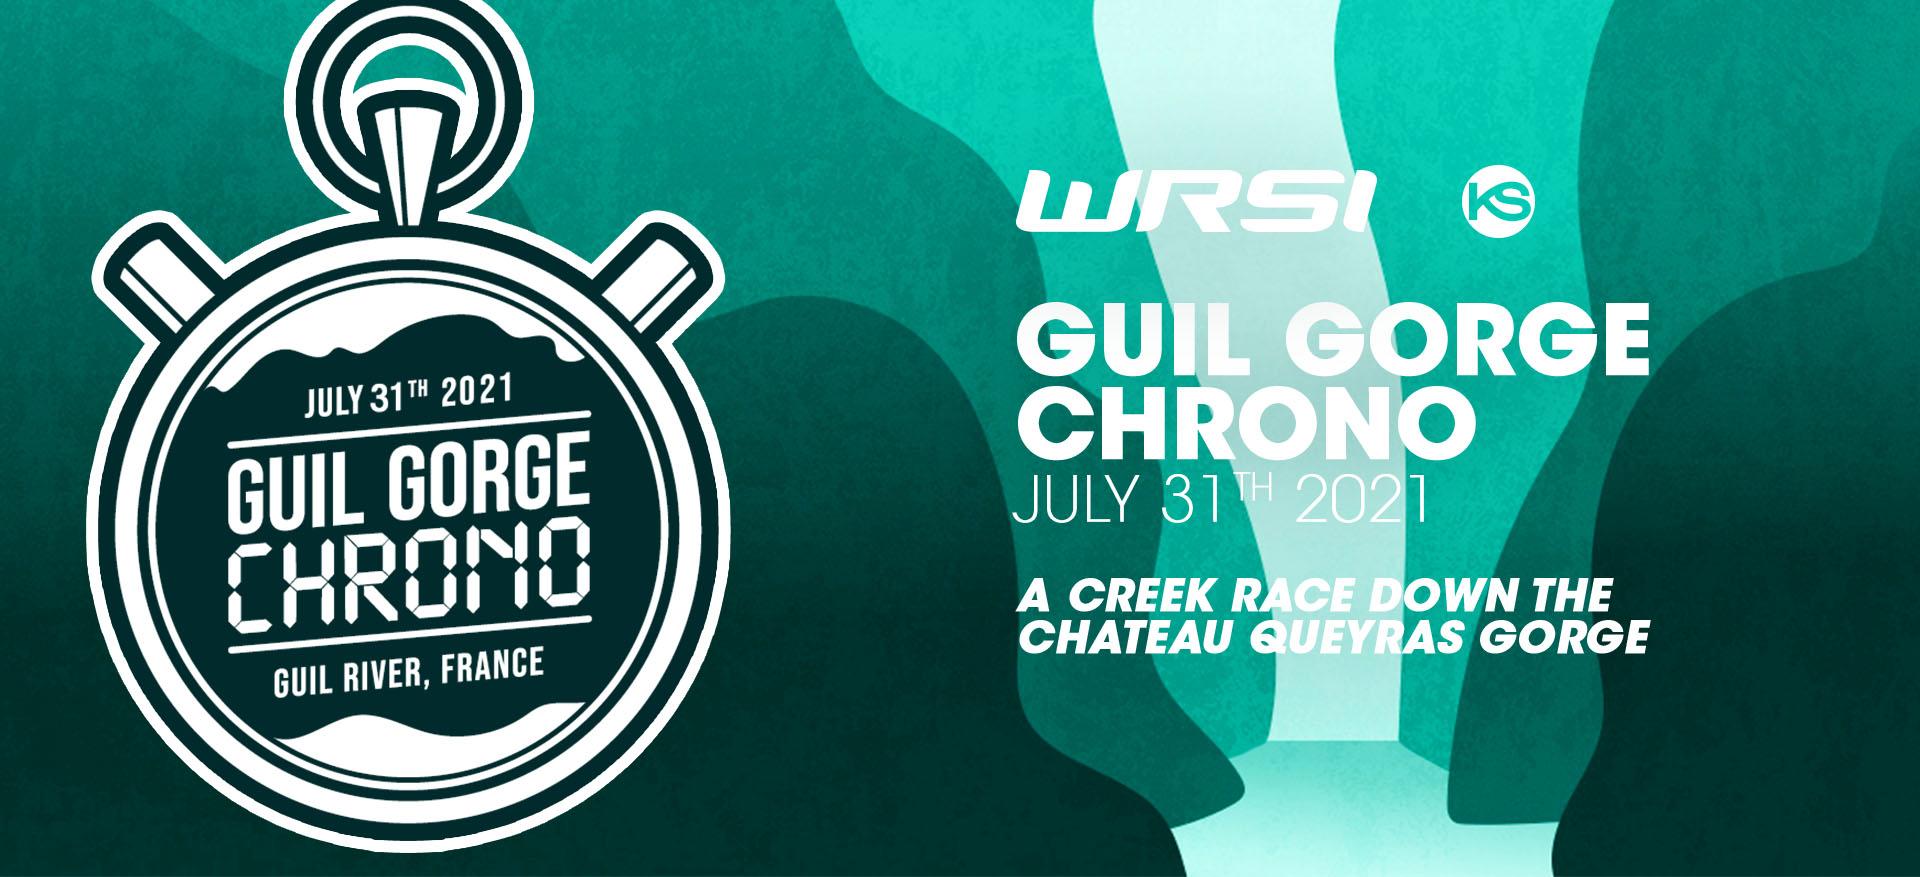 Guil Gorge Chrono 2021